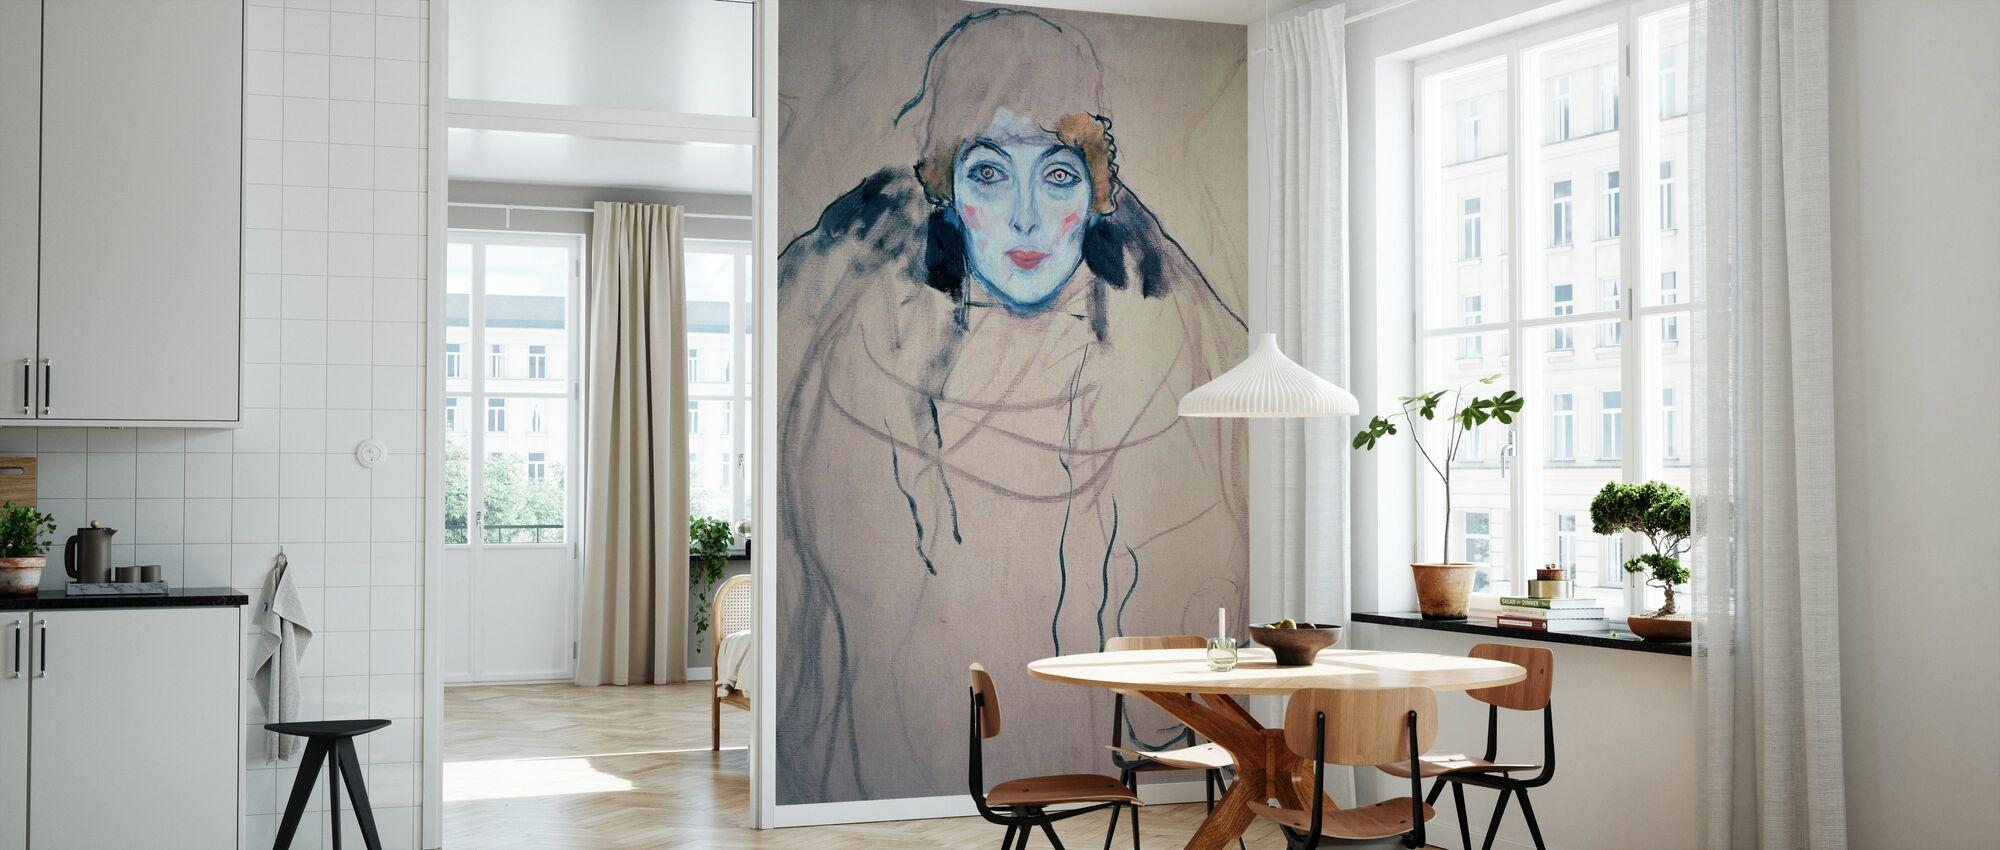 Head of a Woman, Gustav Klimt - Wallpaper - Kitchen